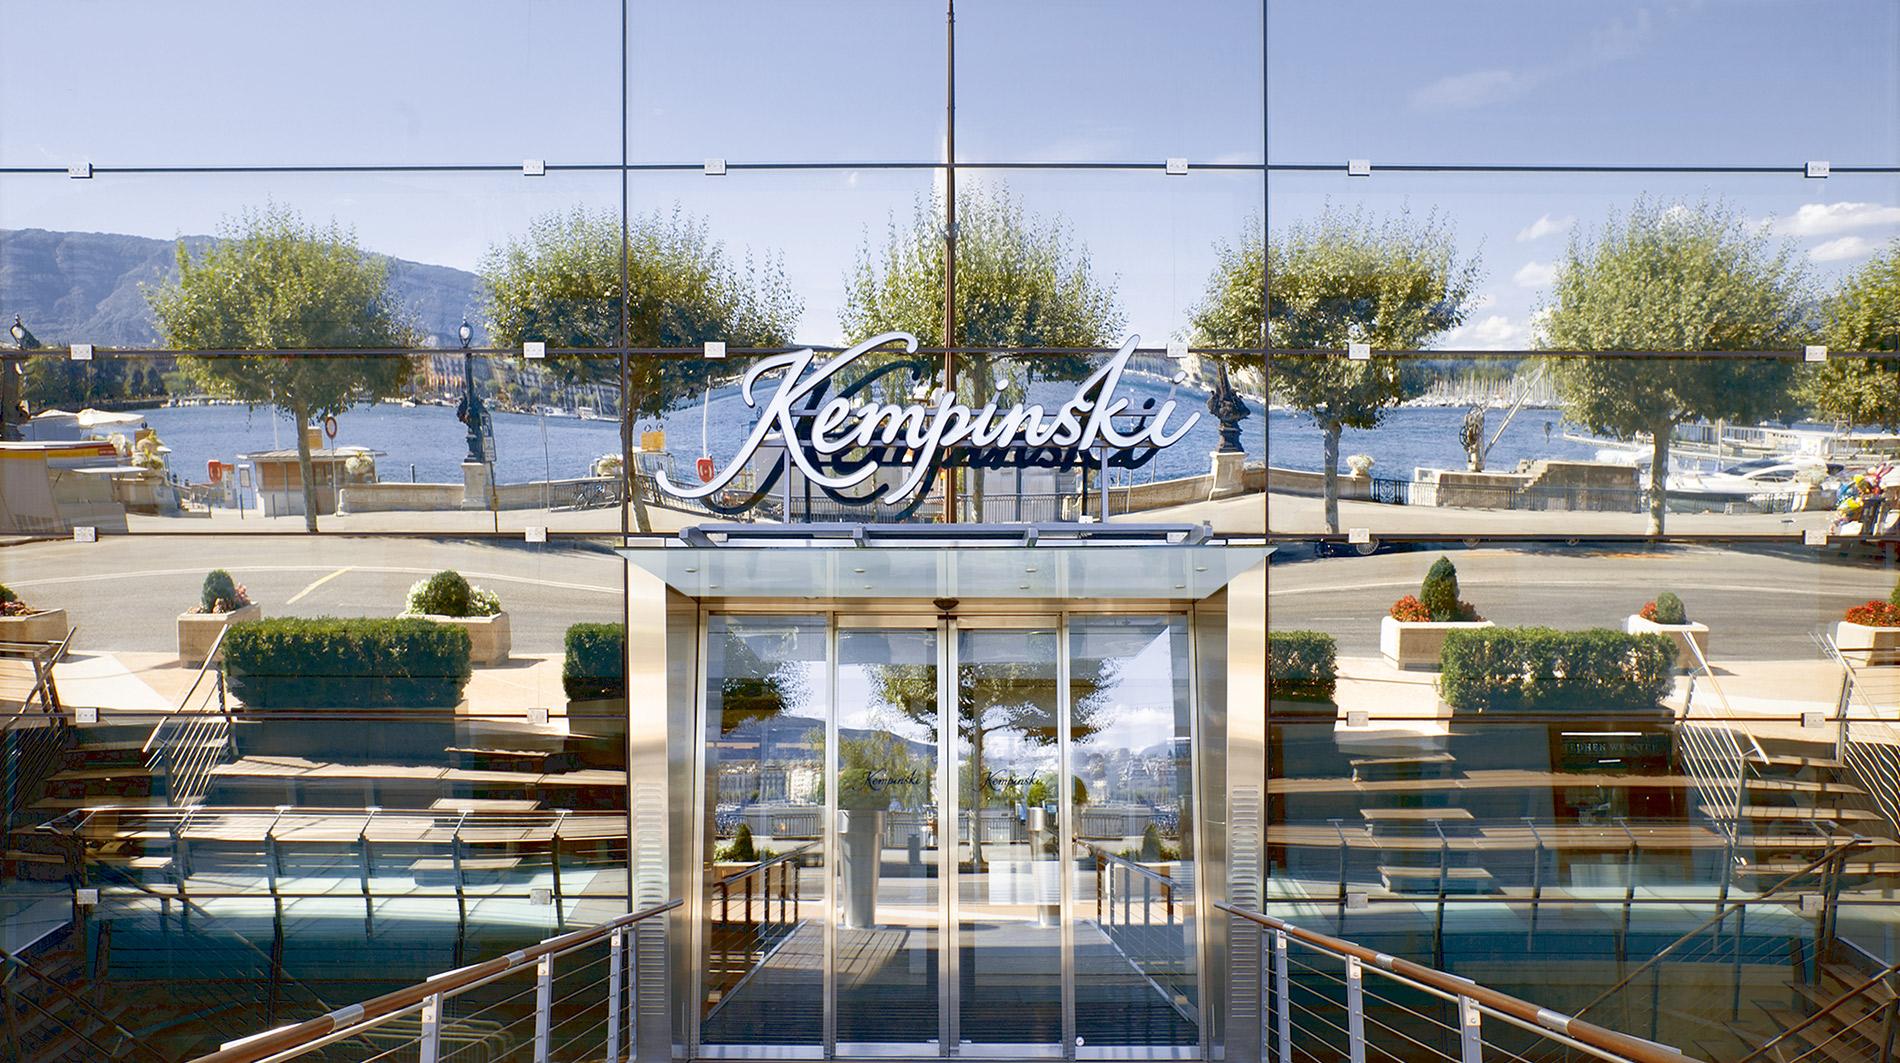 Kempinski Geneva front door